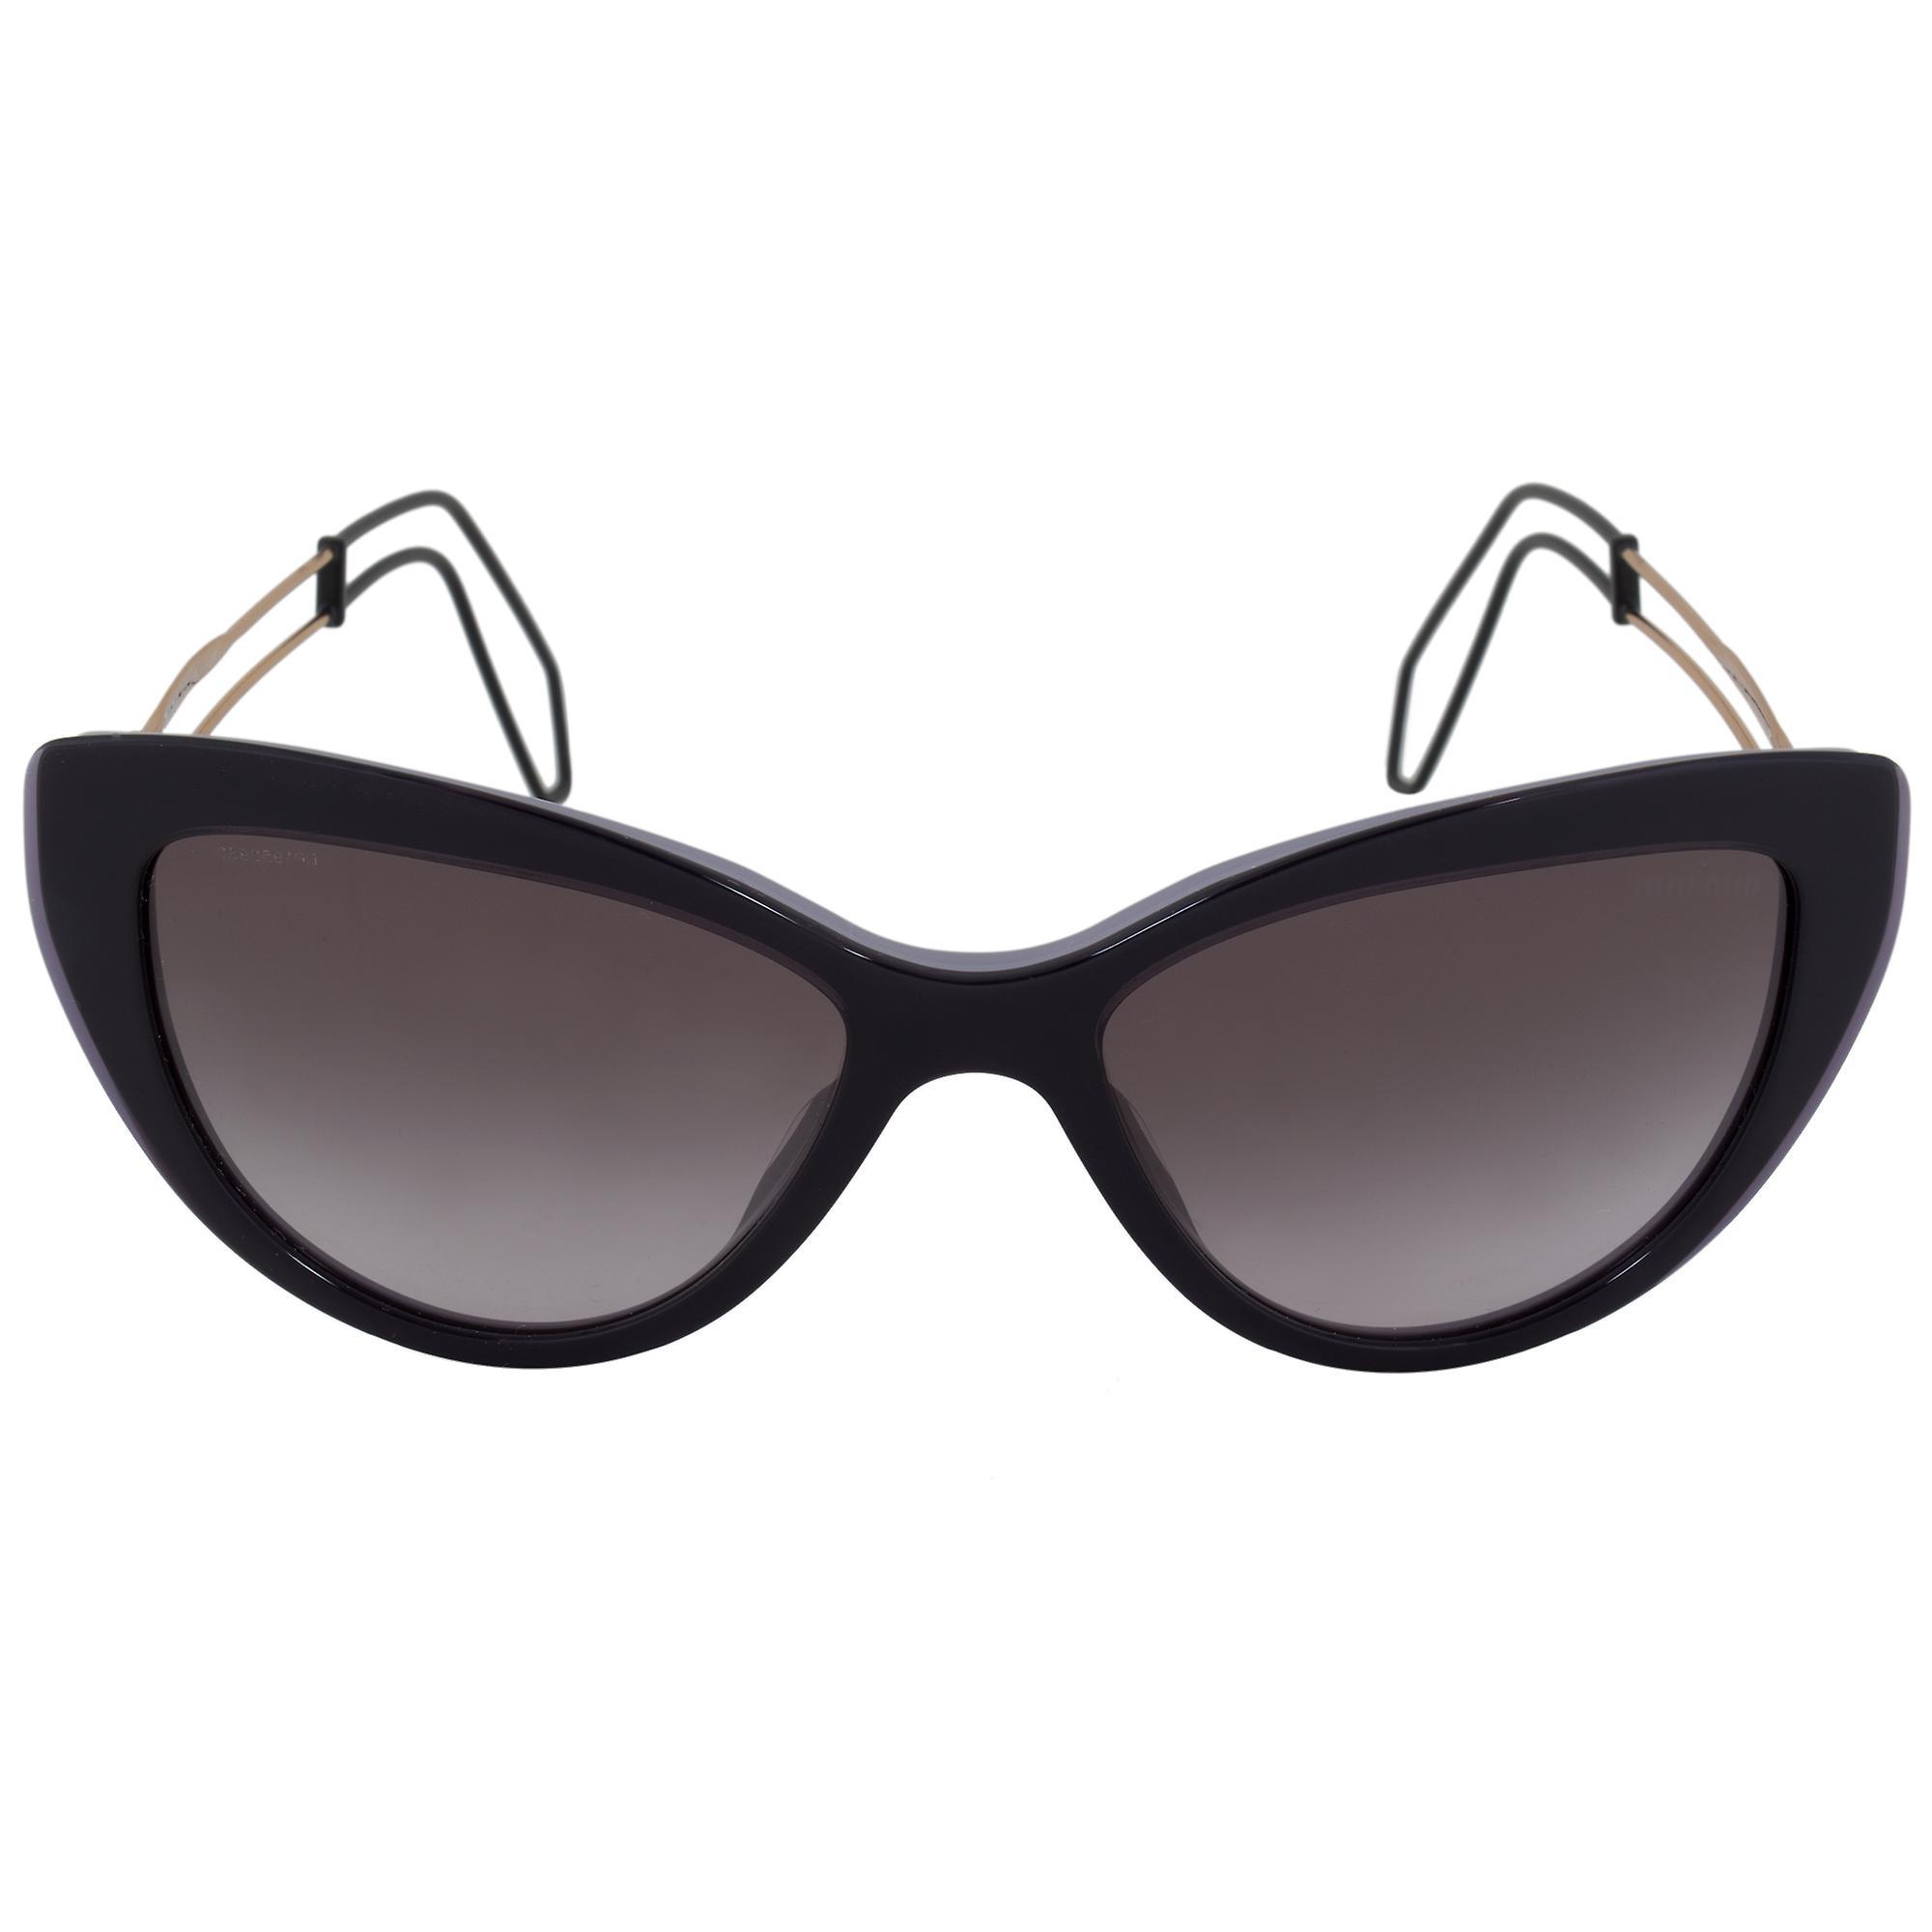 Miu Miu Cat Eye Sunglasses SMU12RS USN3E2 55   Purple Frame   Gray Gradient Lenses